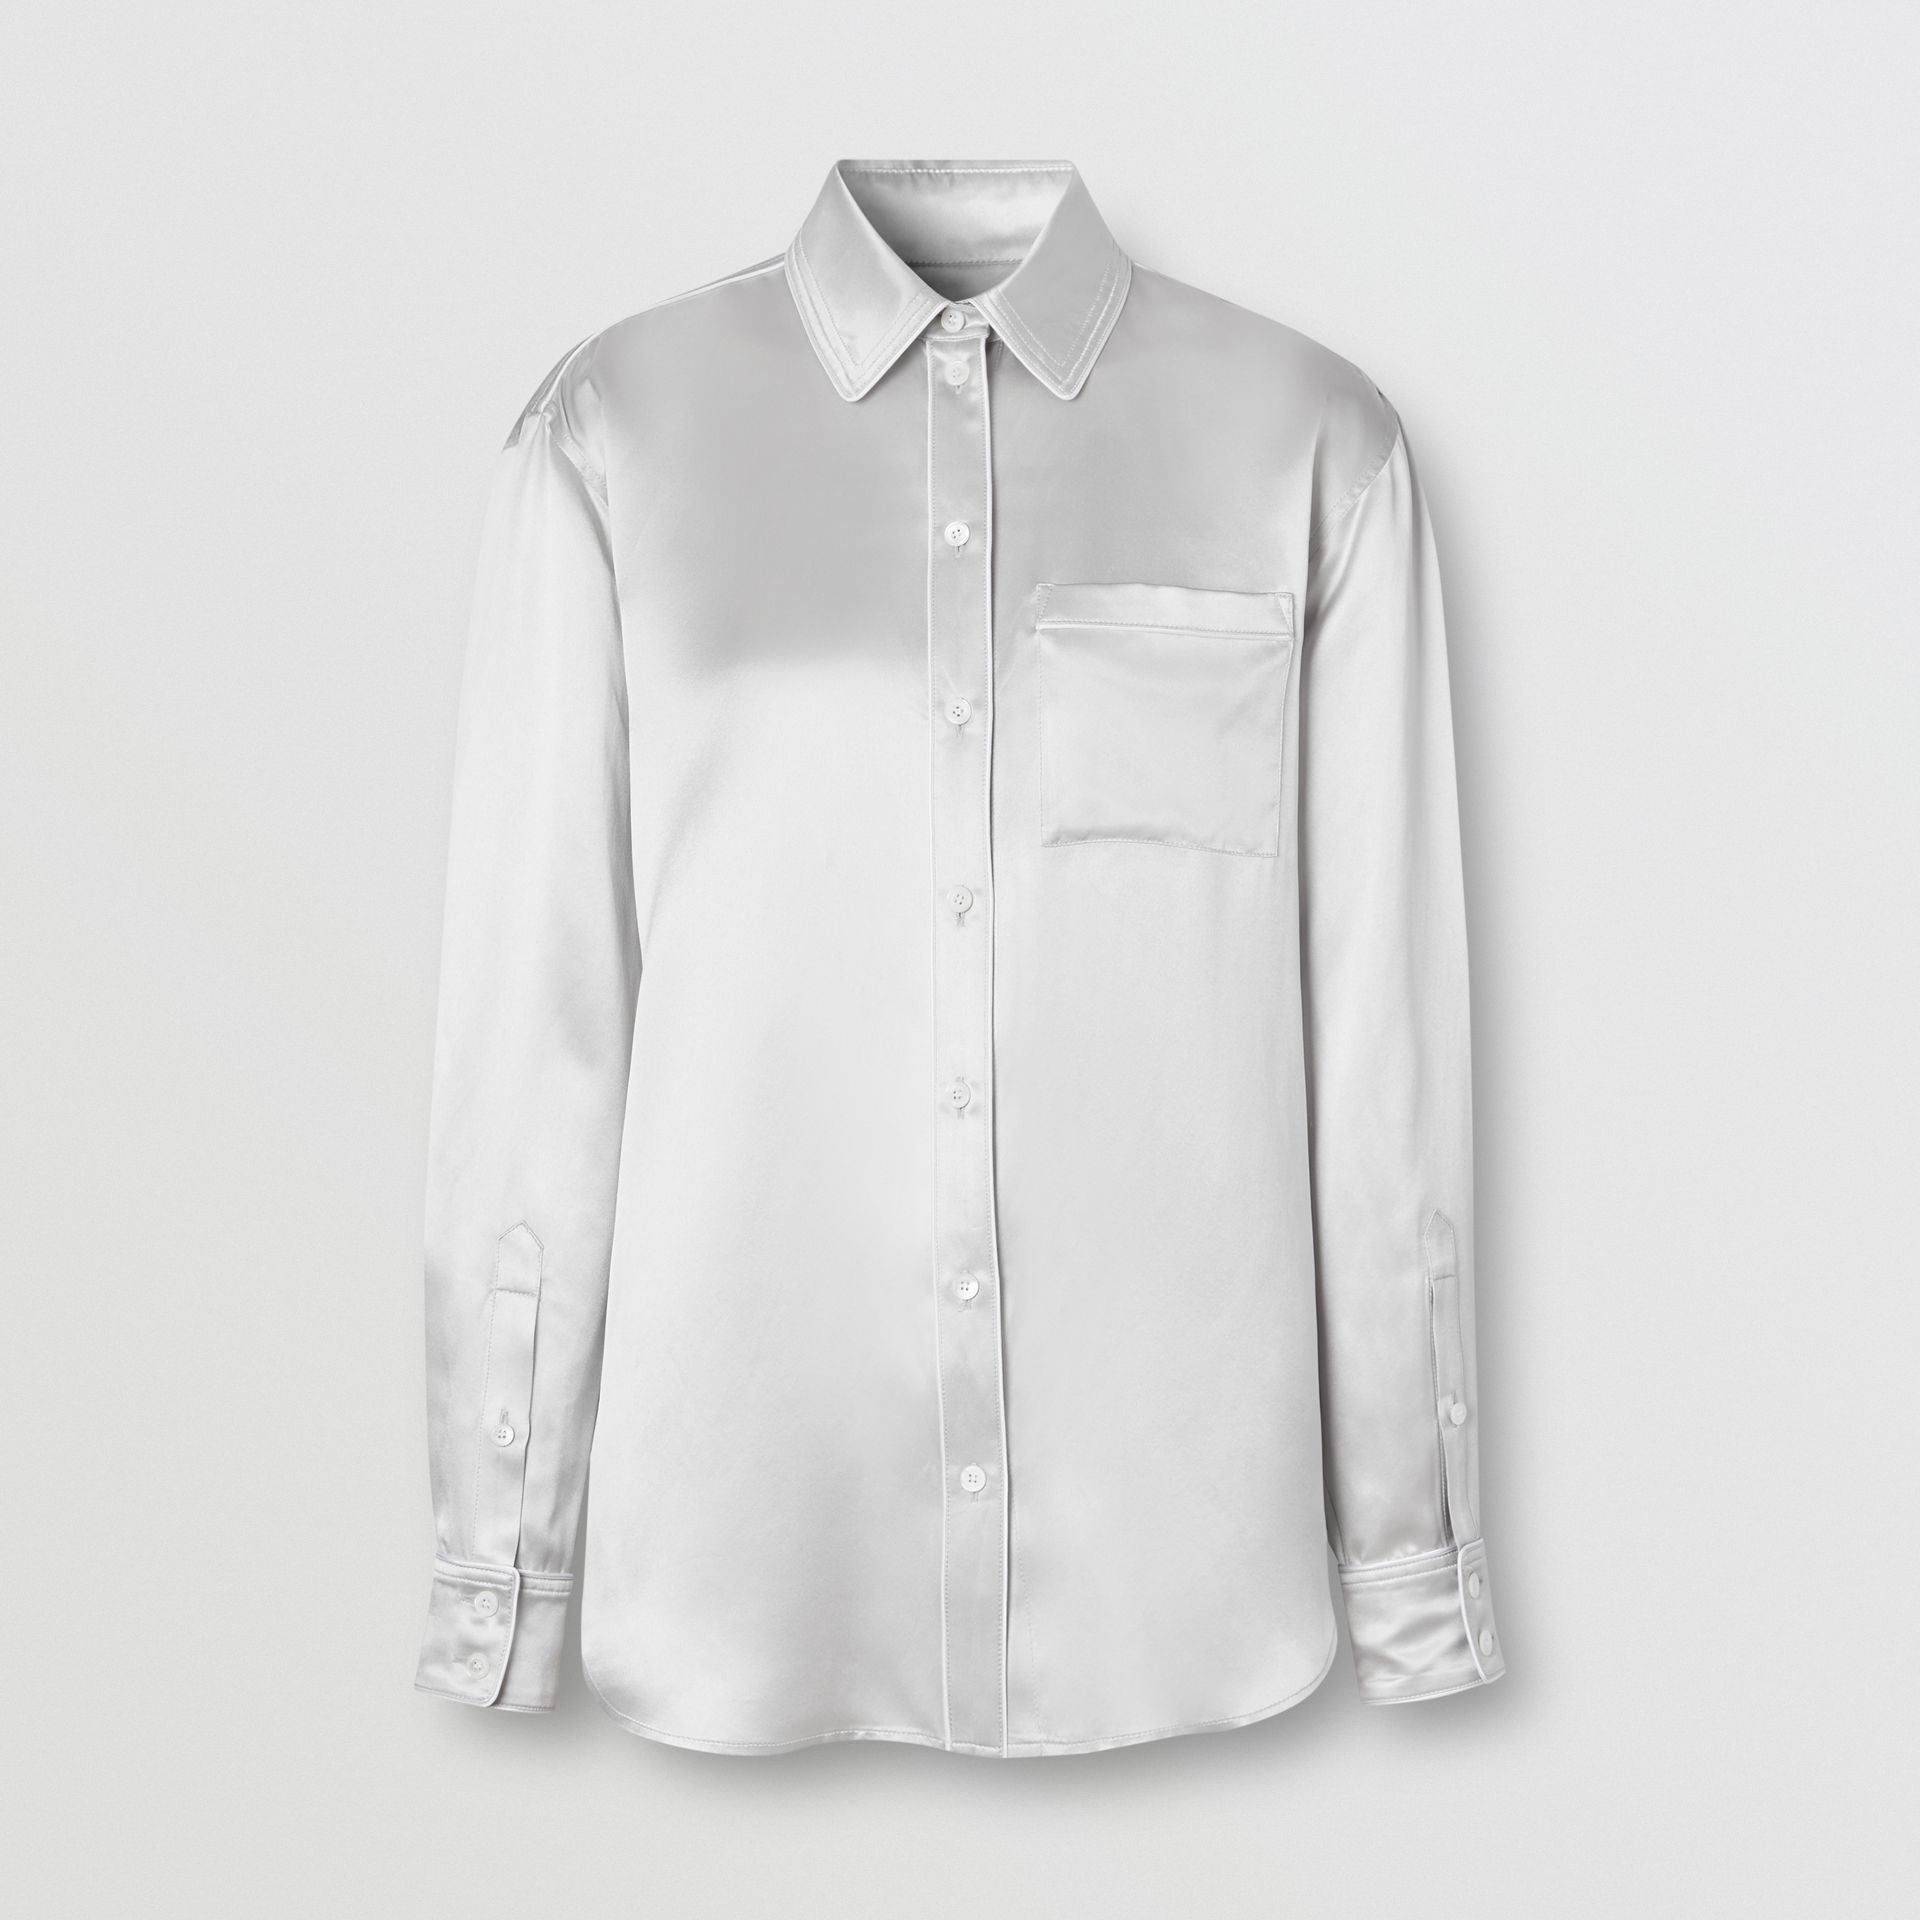 Silk Satin Shirt in Light Pebble Grey - Women | Burberry - gallery image 3